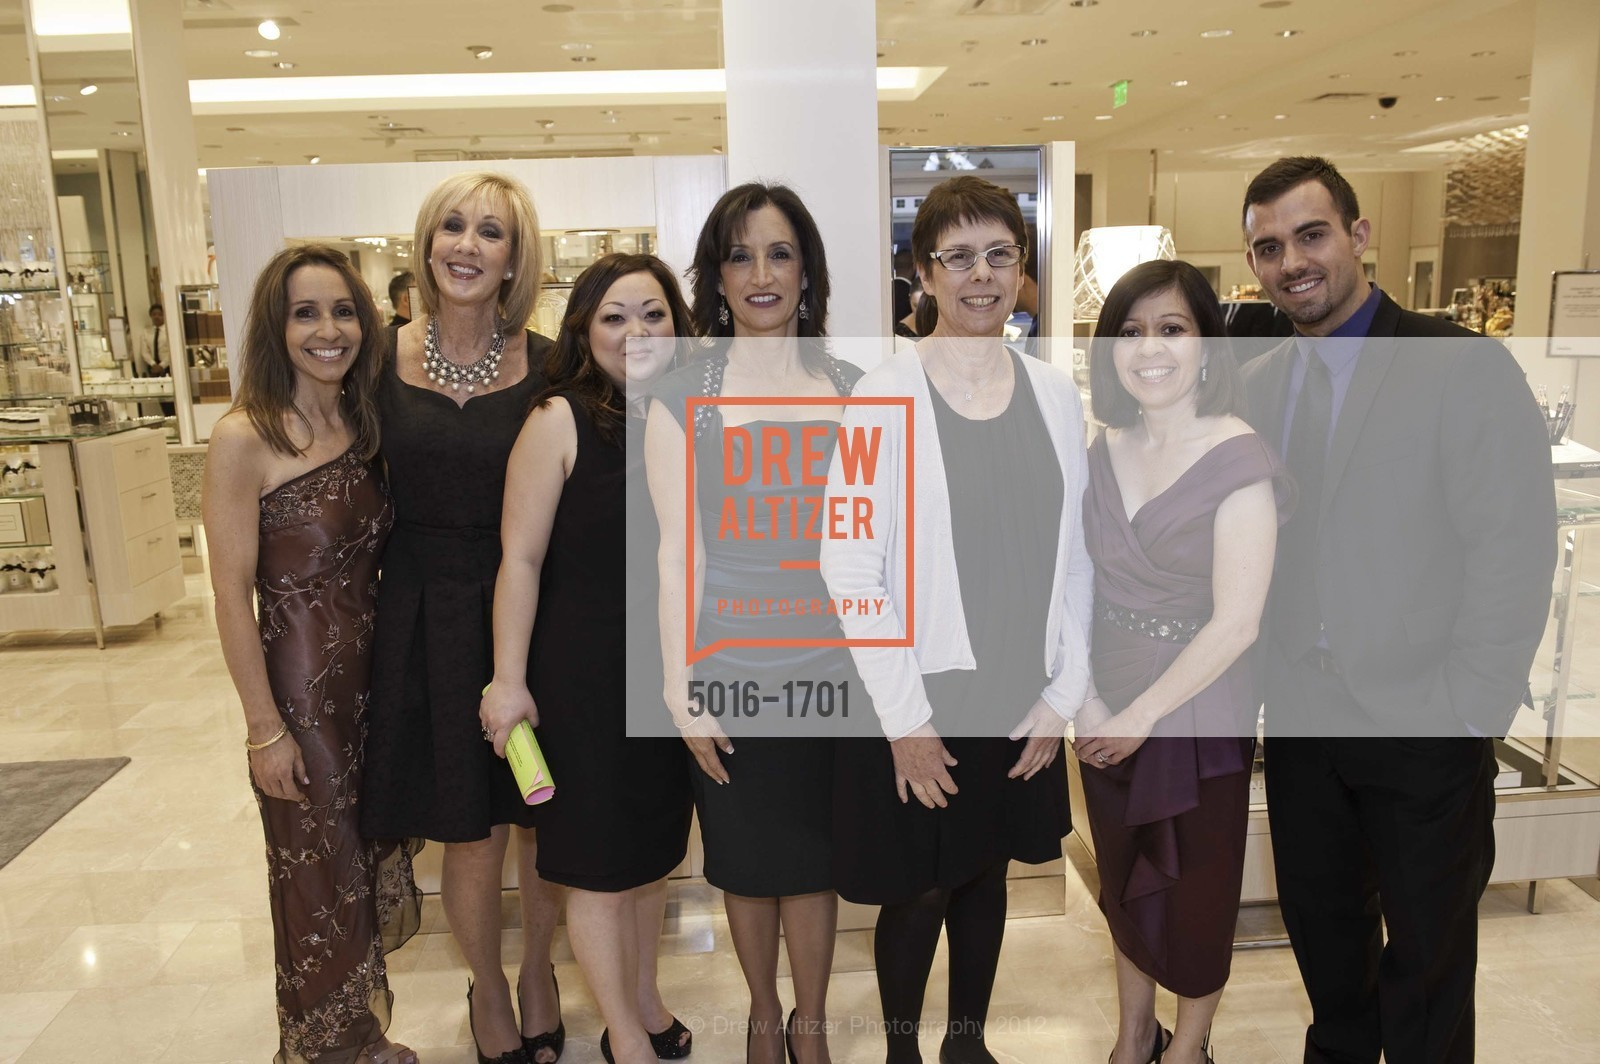 Lisa Cecconi, Carol Alteman, Kimiko Garcia, Luz Borromeo, Nancy Strandberg, Virma Melero, Nick Grutzeck, Photo #5016-1701